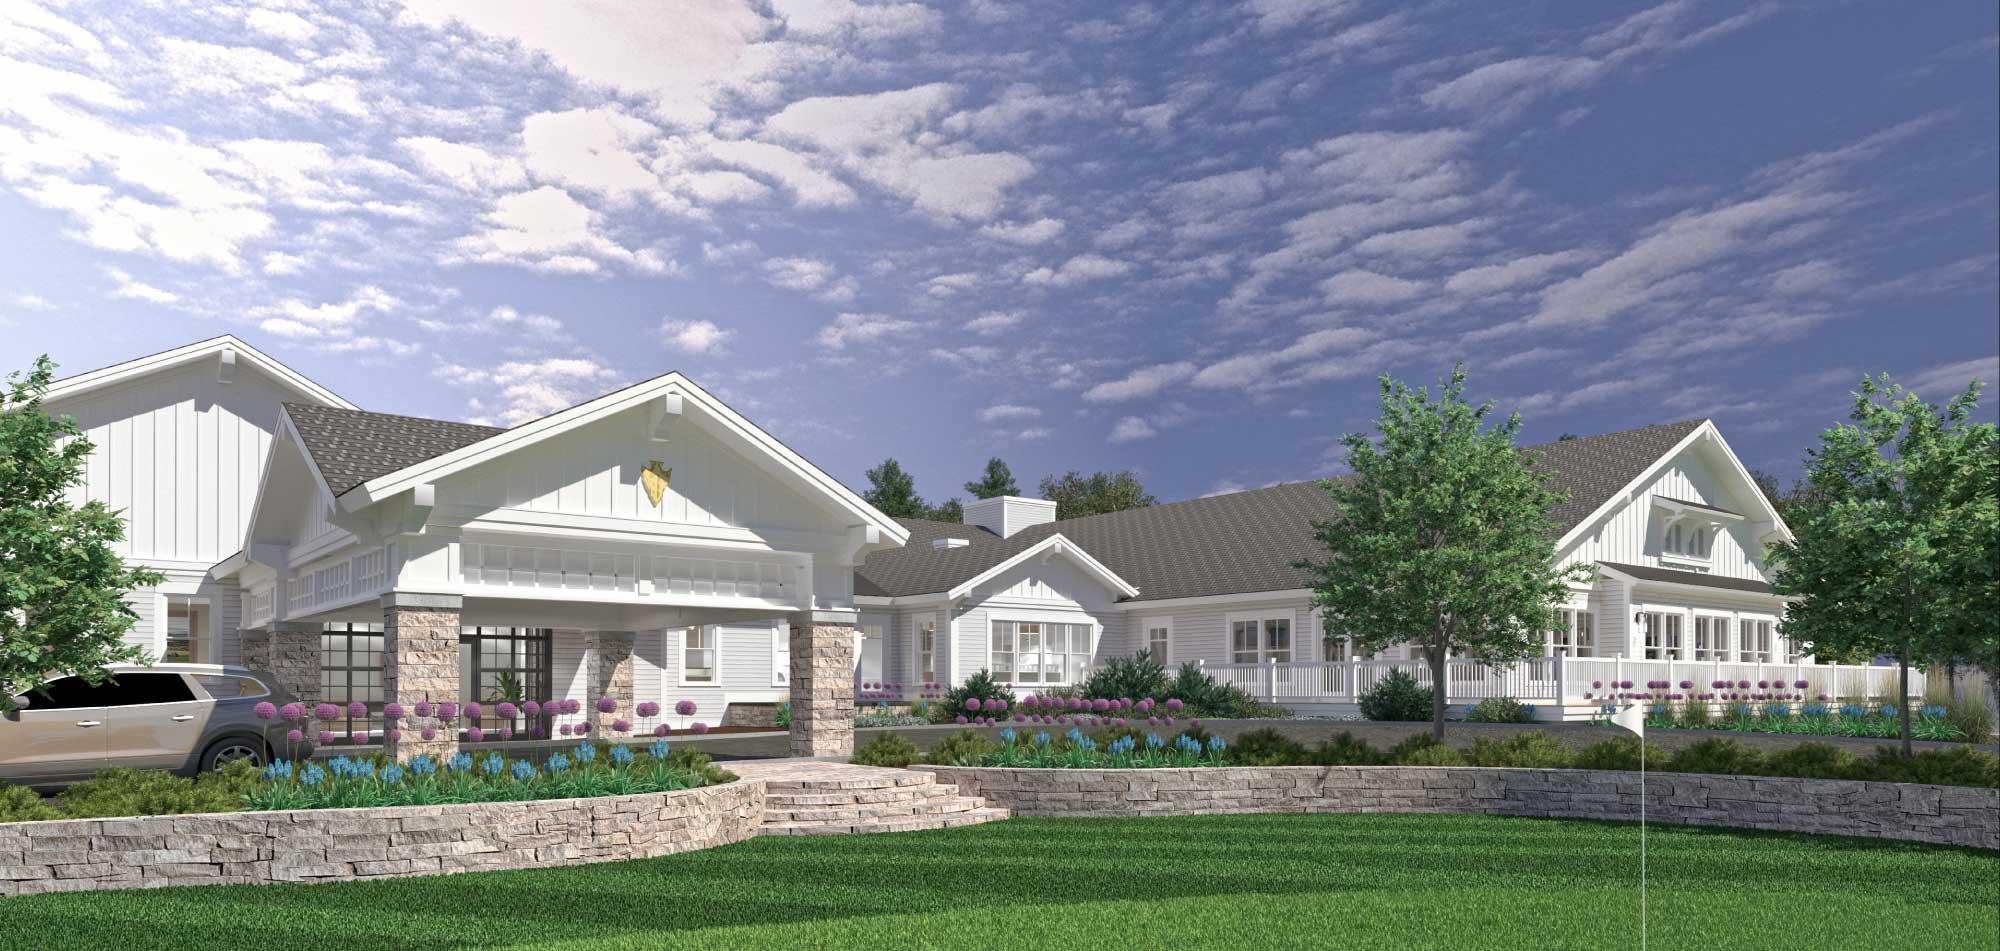 Nashawtuc-Country Club Design